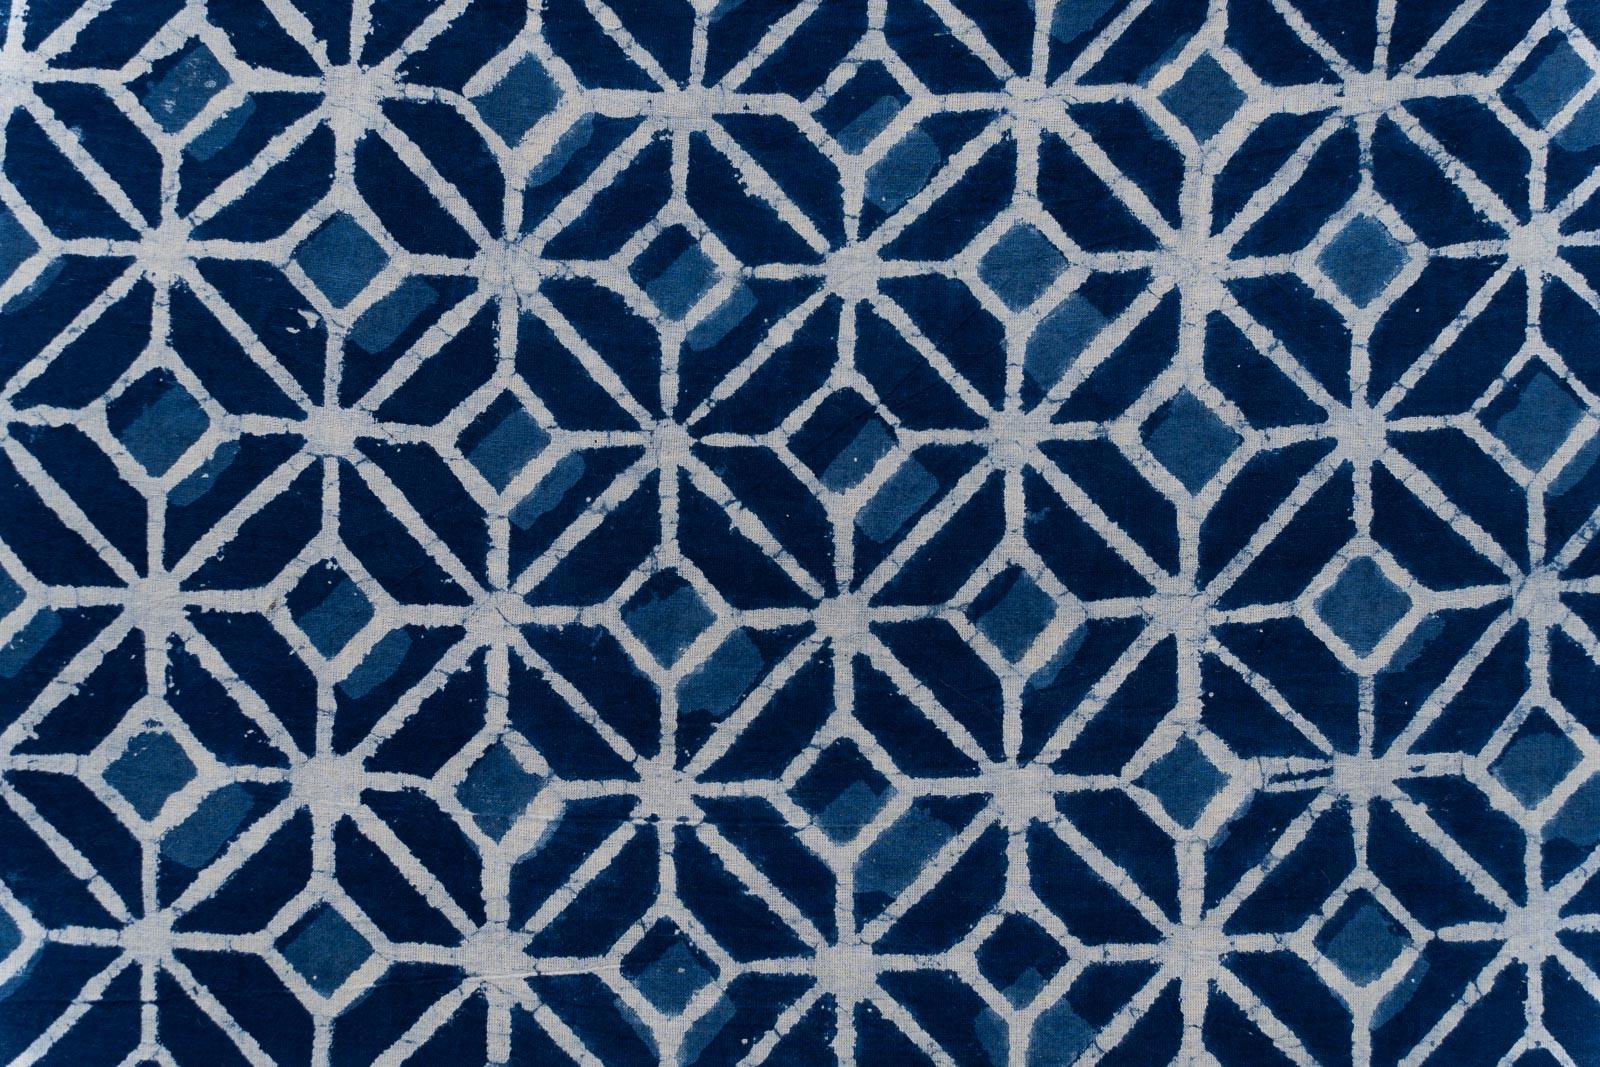 Indigo Diamond Hand Block Printed Fabric